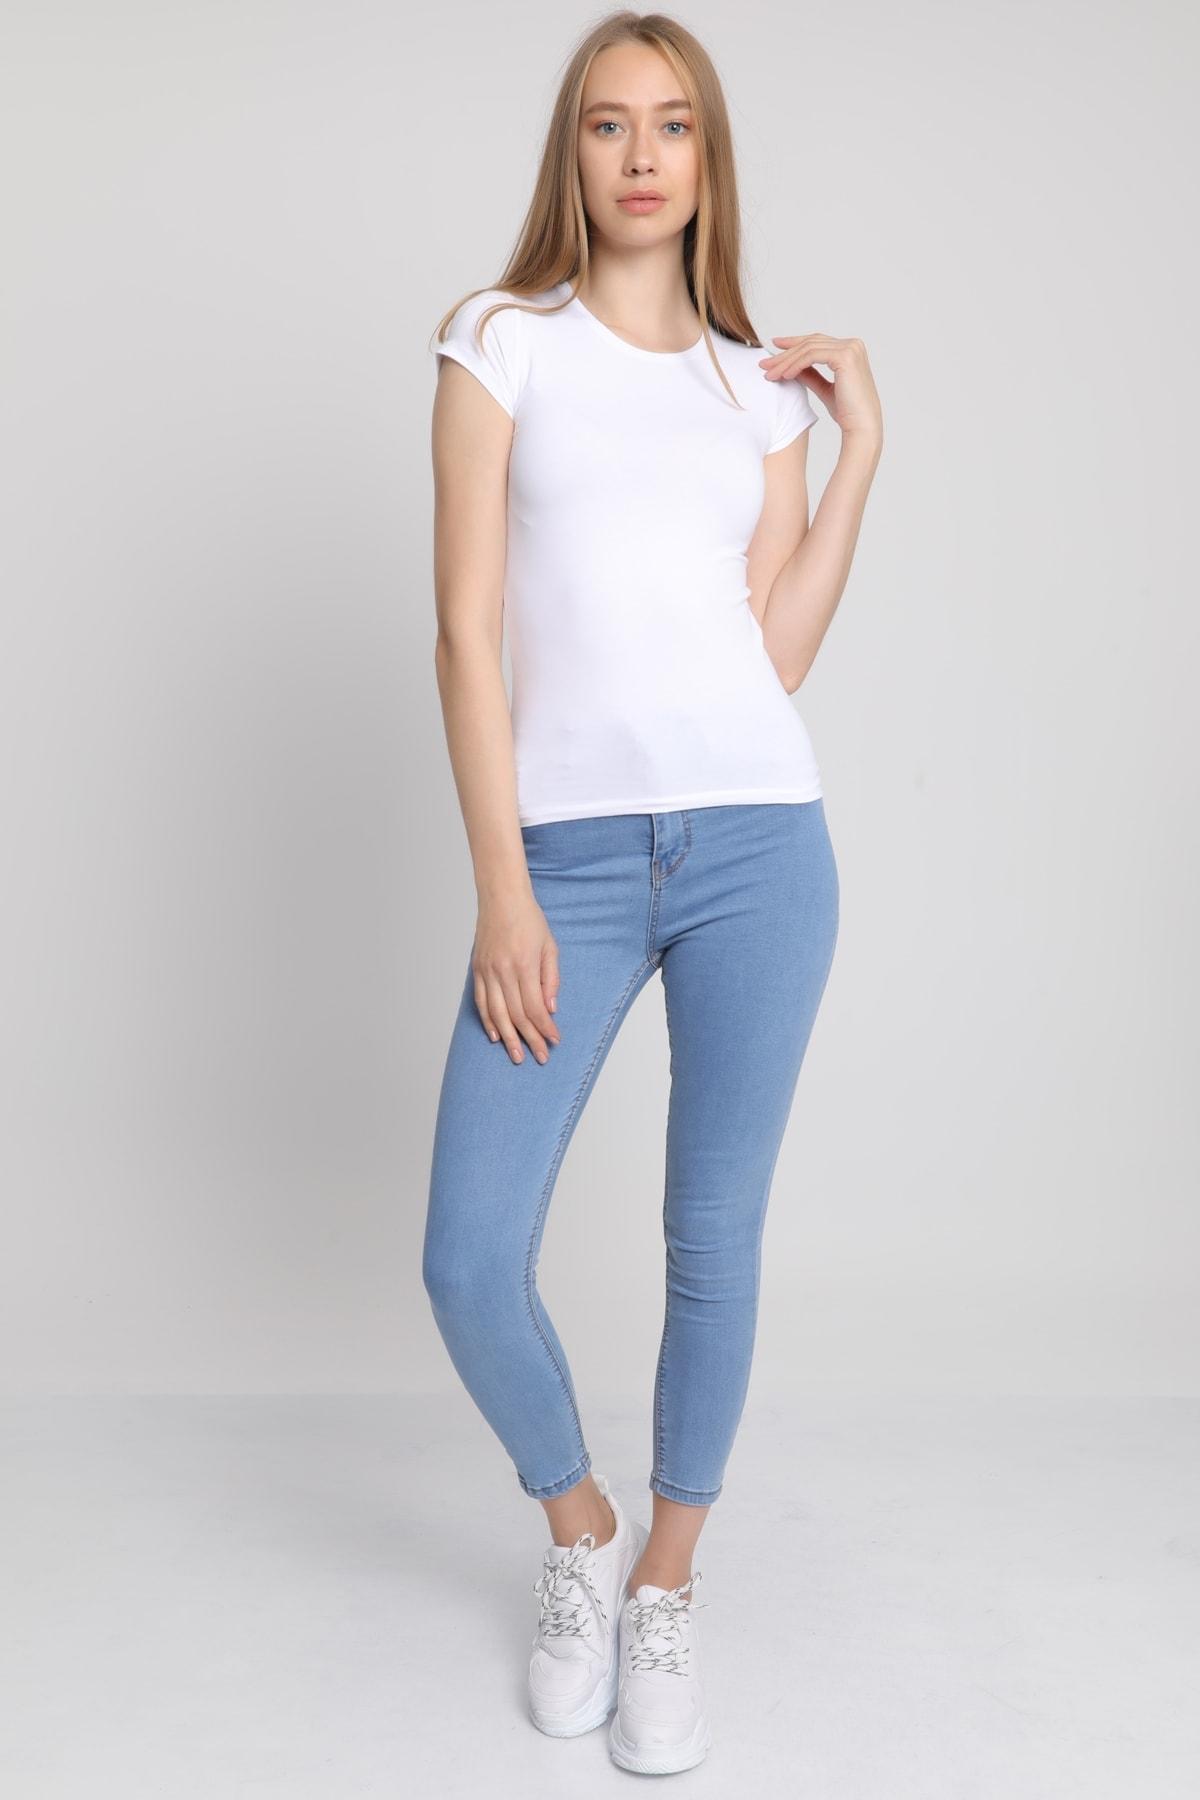 MD trend Kadın Beyaz Bisiklet Yaka T-Shirt Mdt3511 1